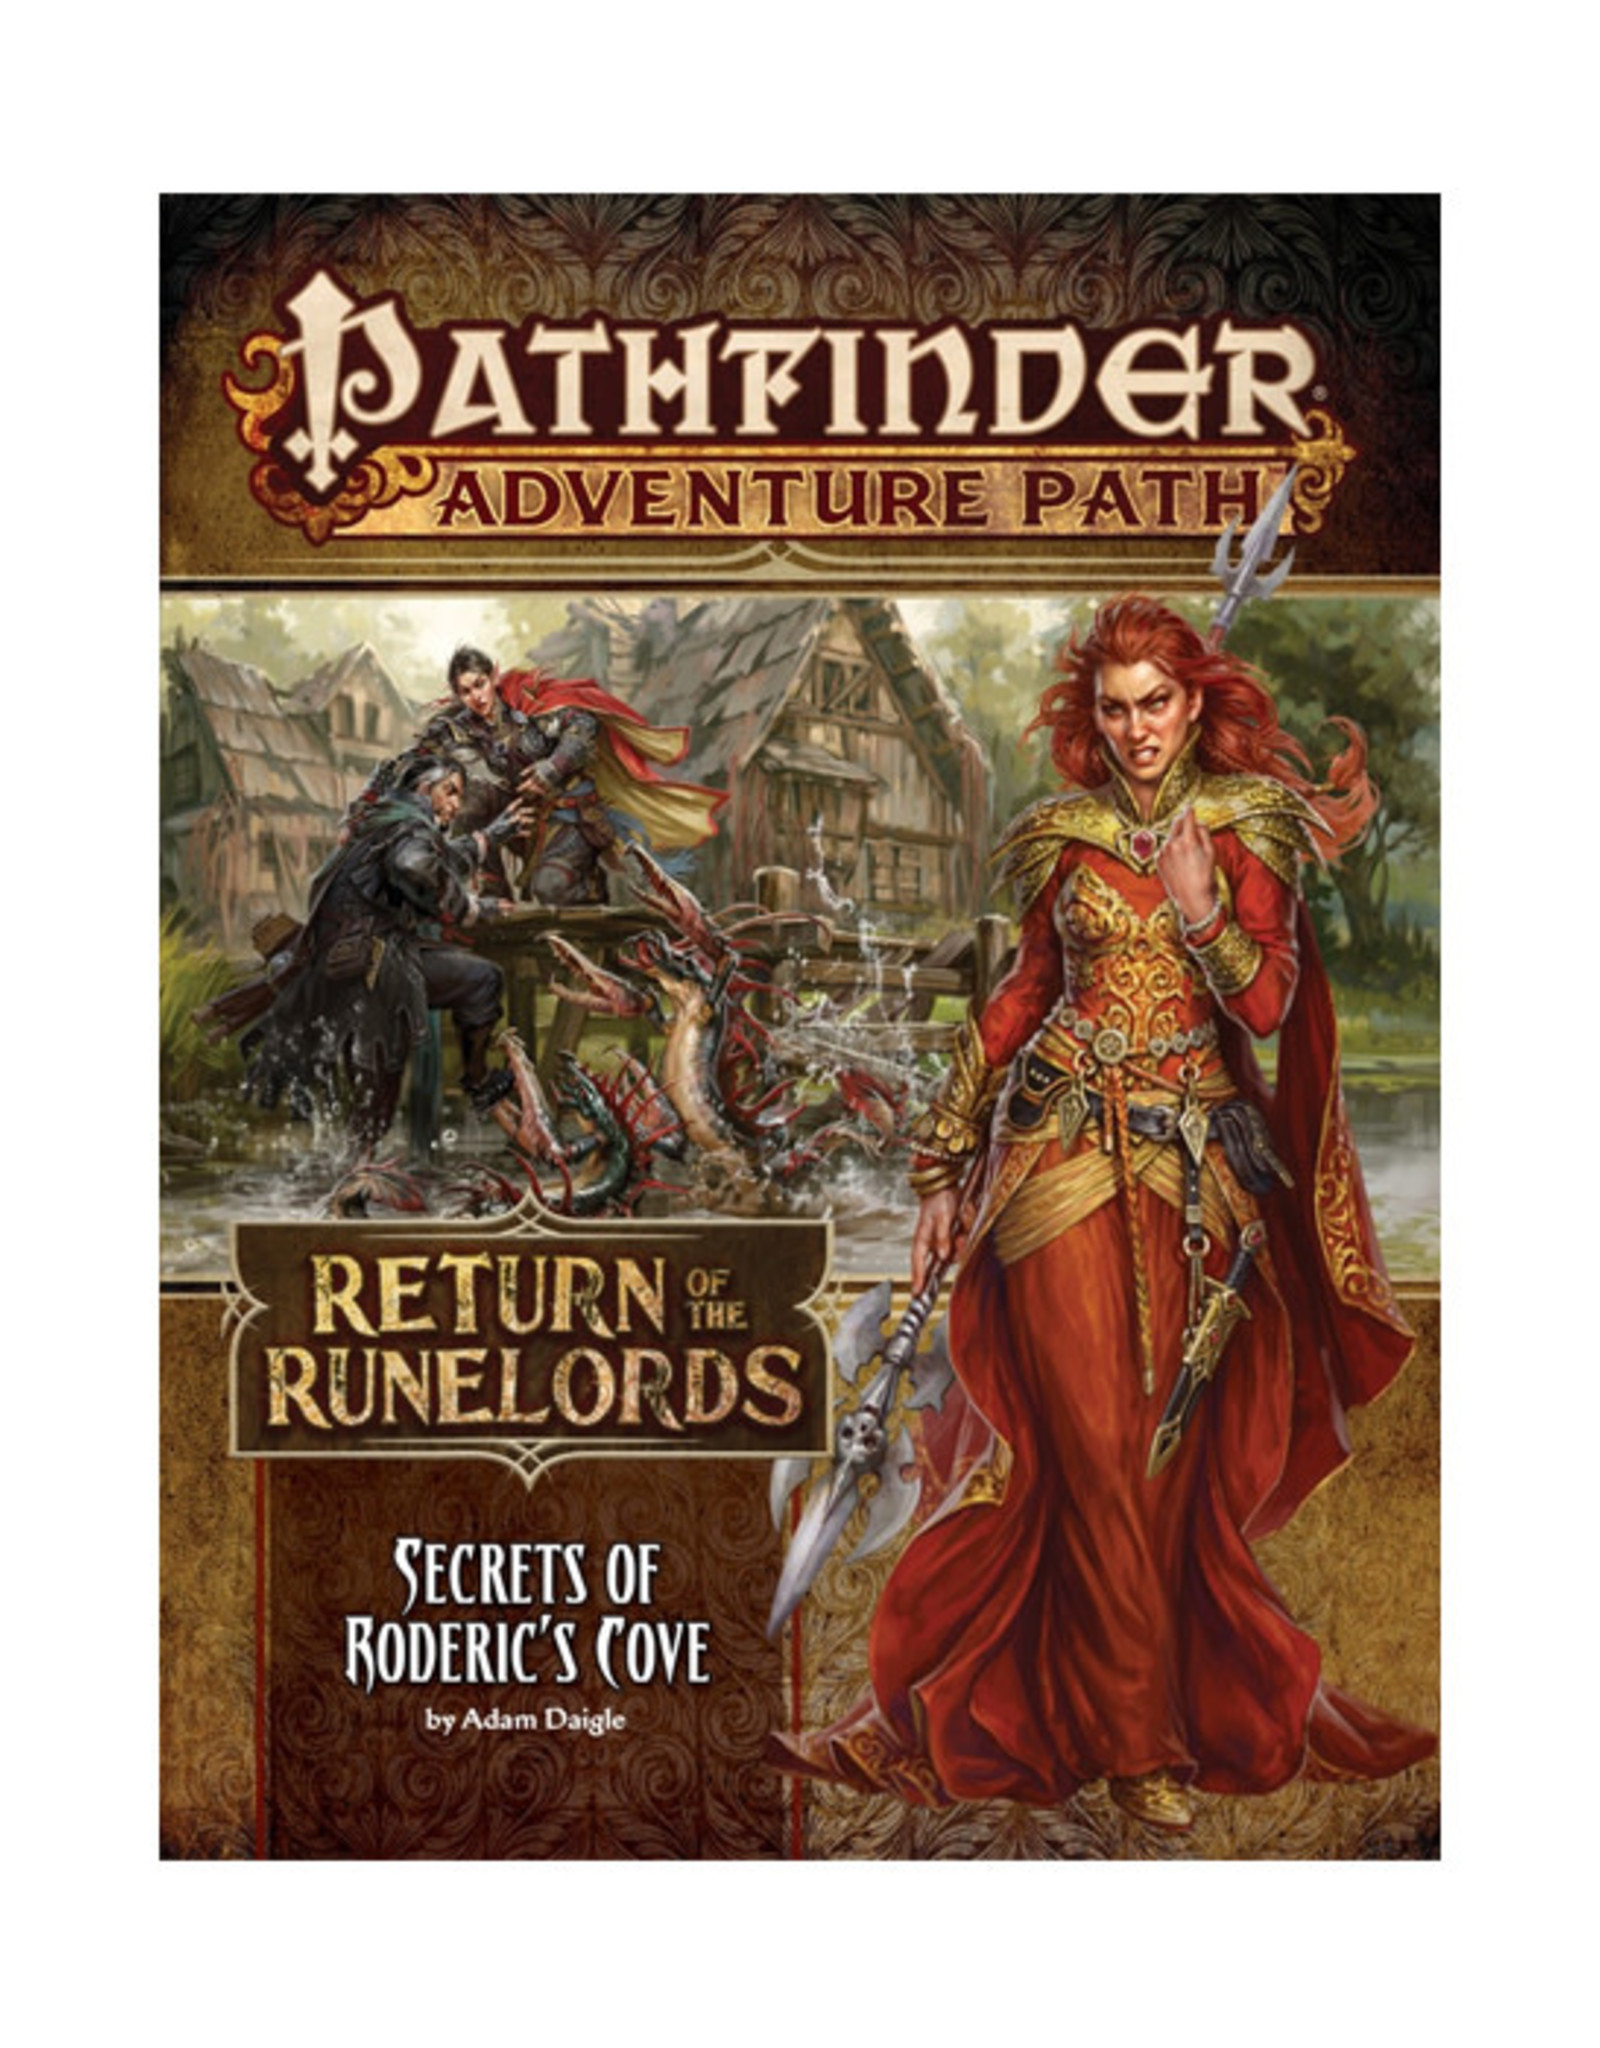 Pathfinder Pathfinder: Adventure Path - Return of the Runelords - Secrets of Roderic's Cove